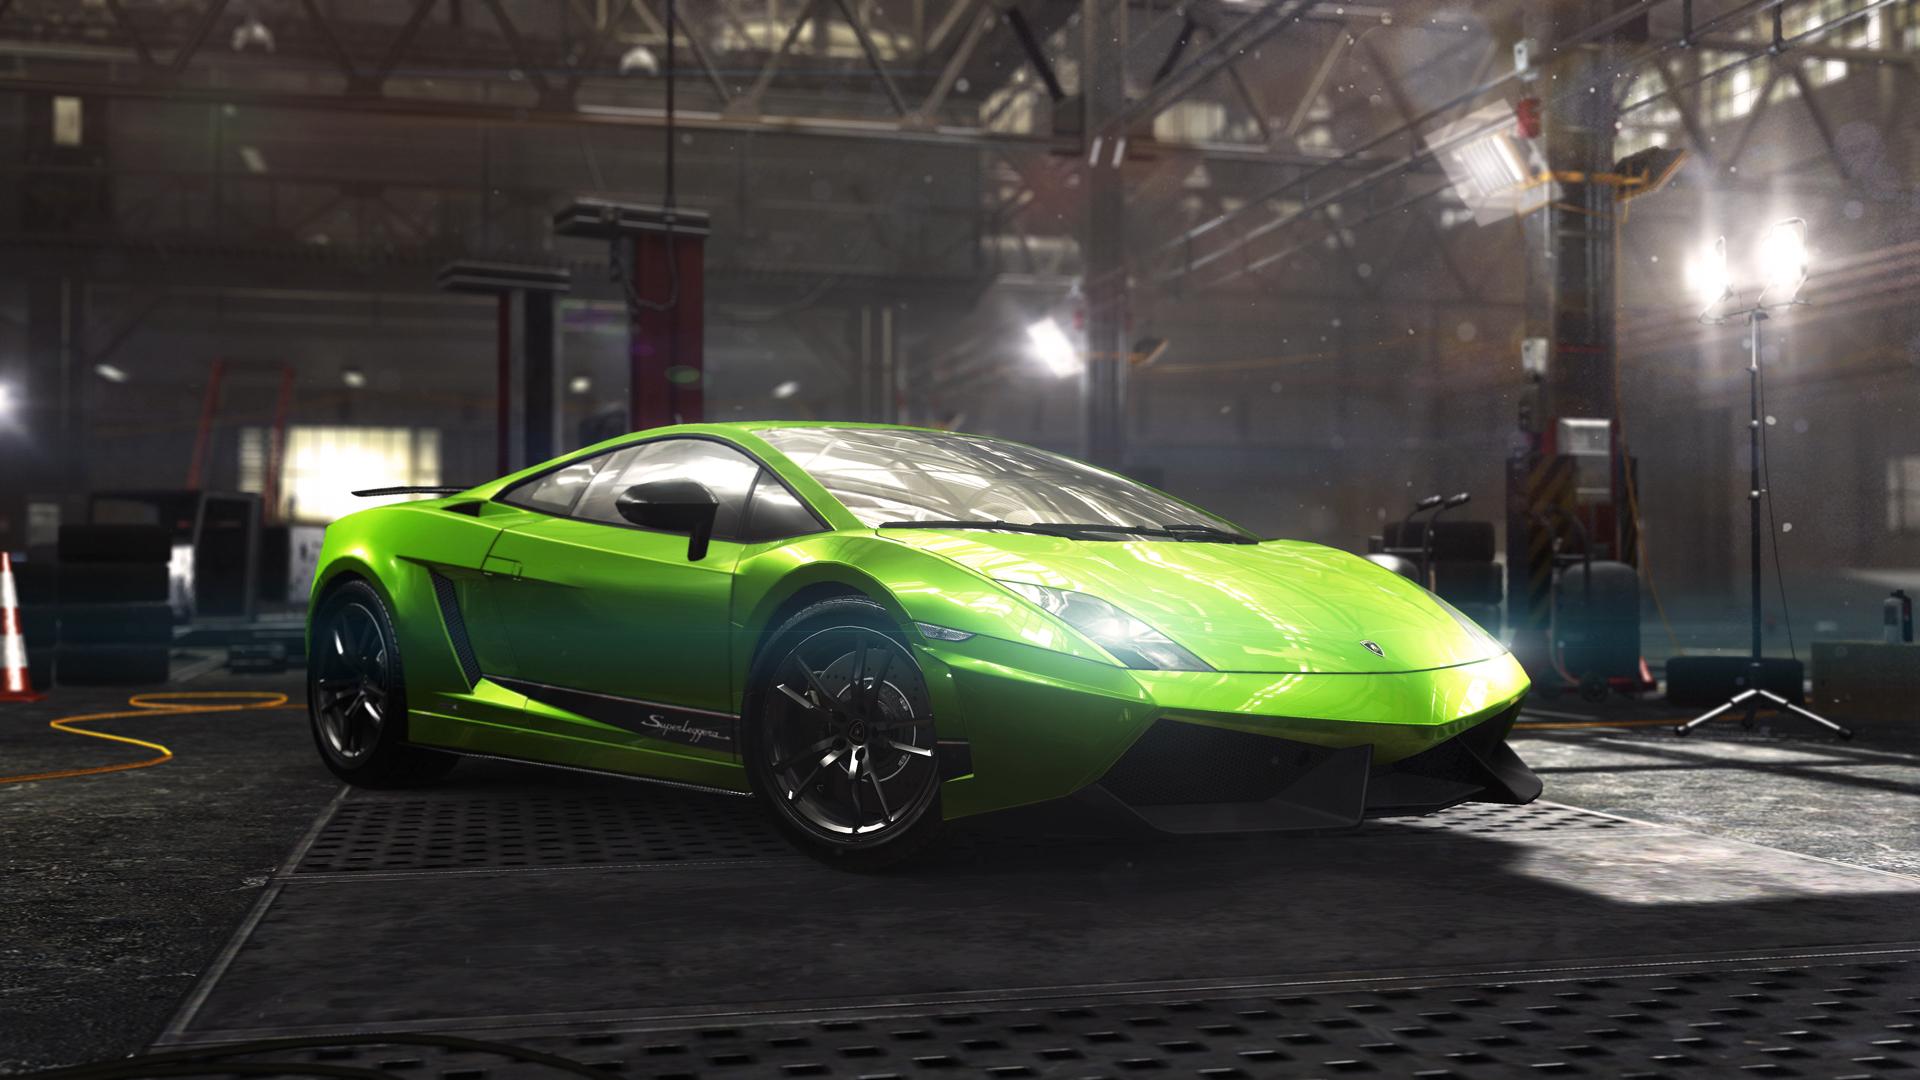 Lamborghini Gallardo Lp570 4 Superleggera Ubisoft S The